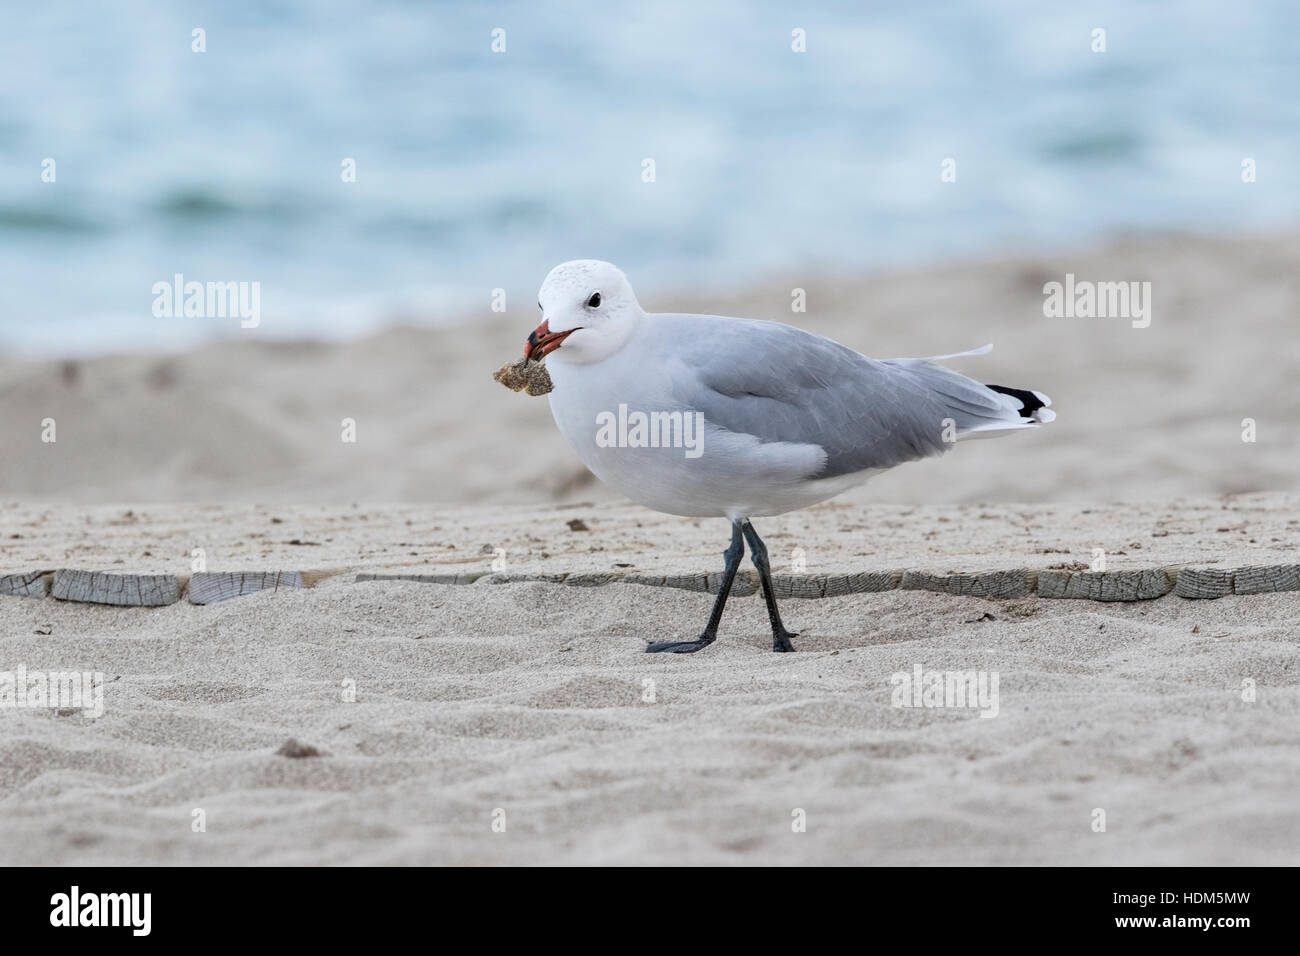 Audouin's gull (Ichthyaetus audouinii) single adult feeding on sandy beach, Mallorca, Balearic Islands - Stock Image